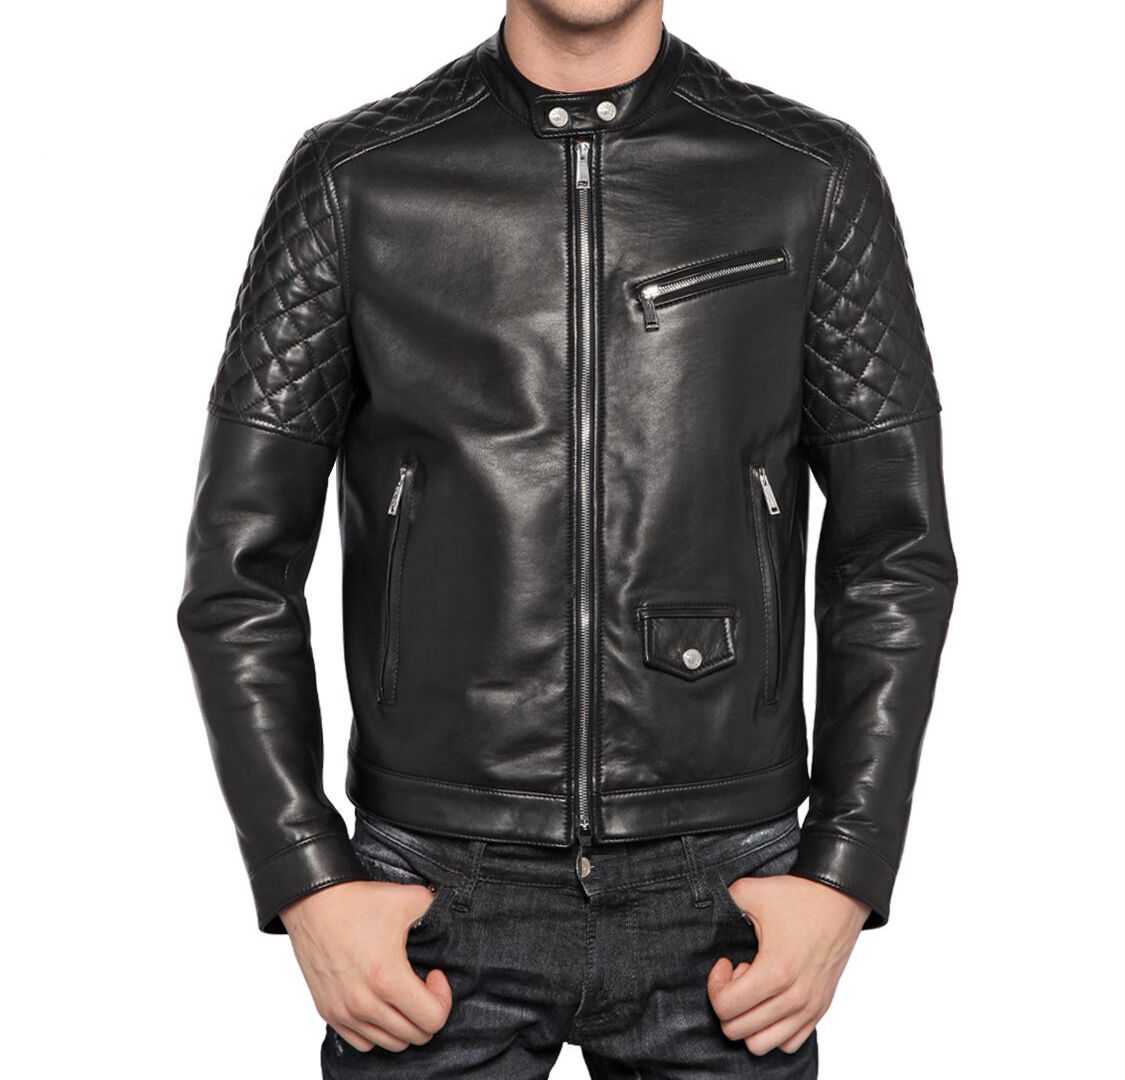 Aus Leder 100% o Haut PU Jacke Jacke Herren Herren Lederjacke md.Tra2